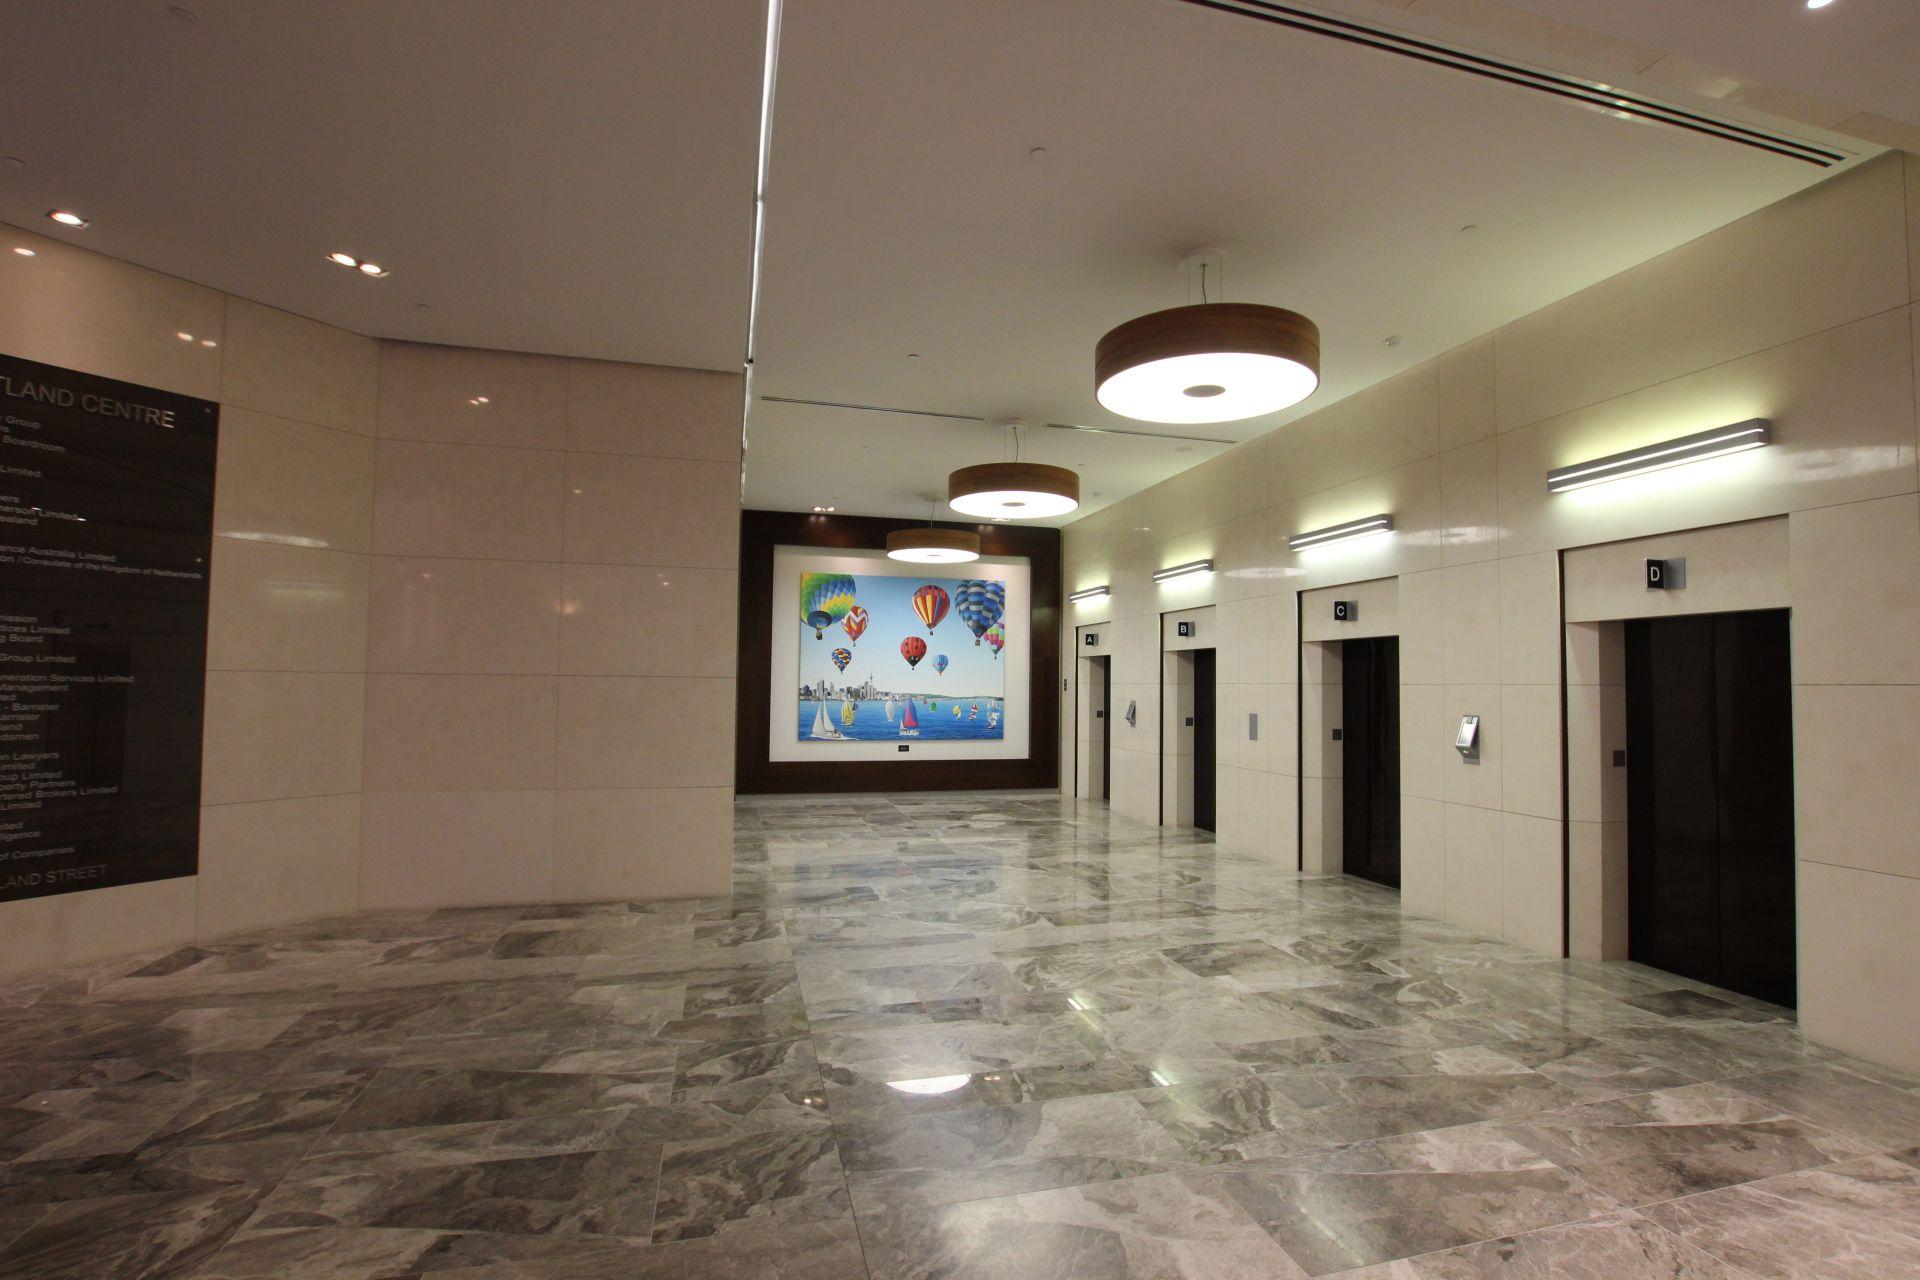 New Bespoke Offices on Shortland Street